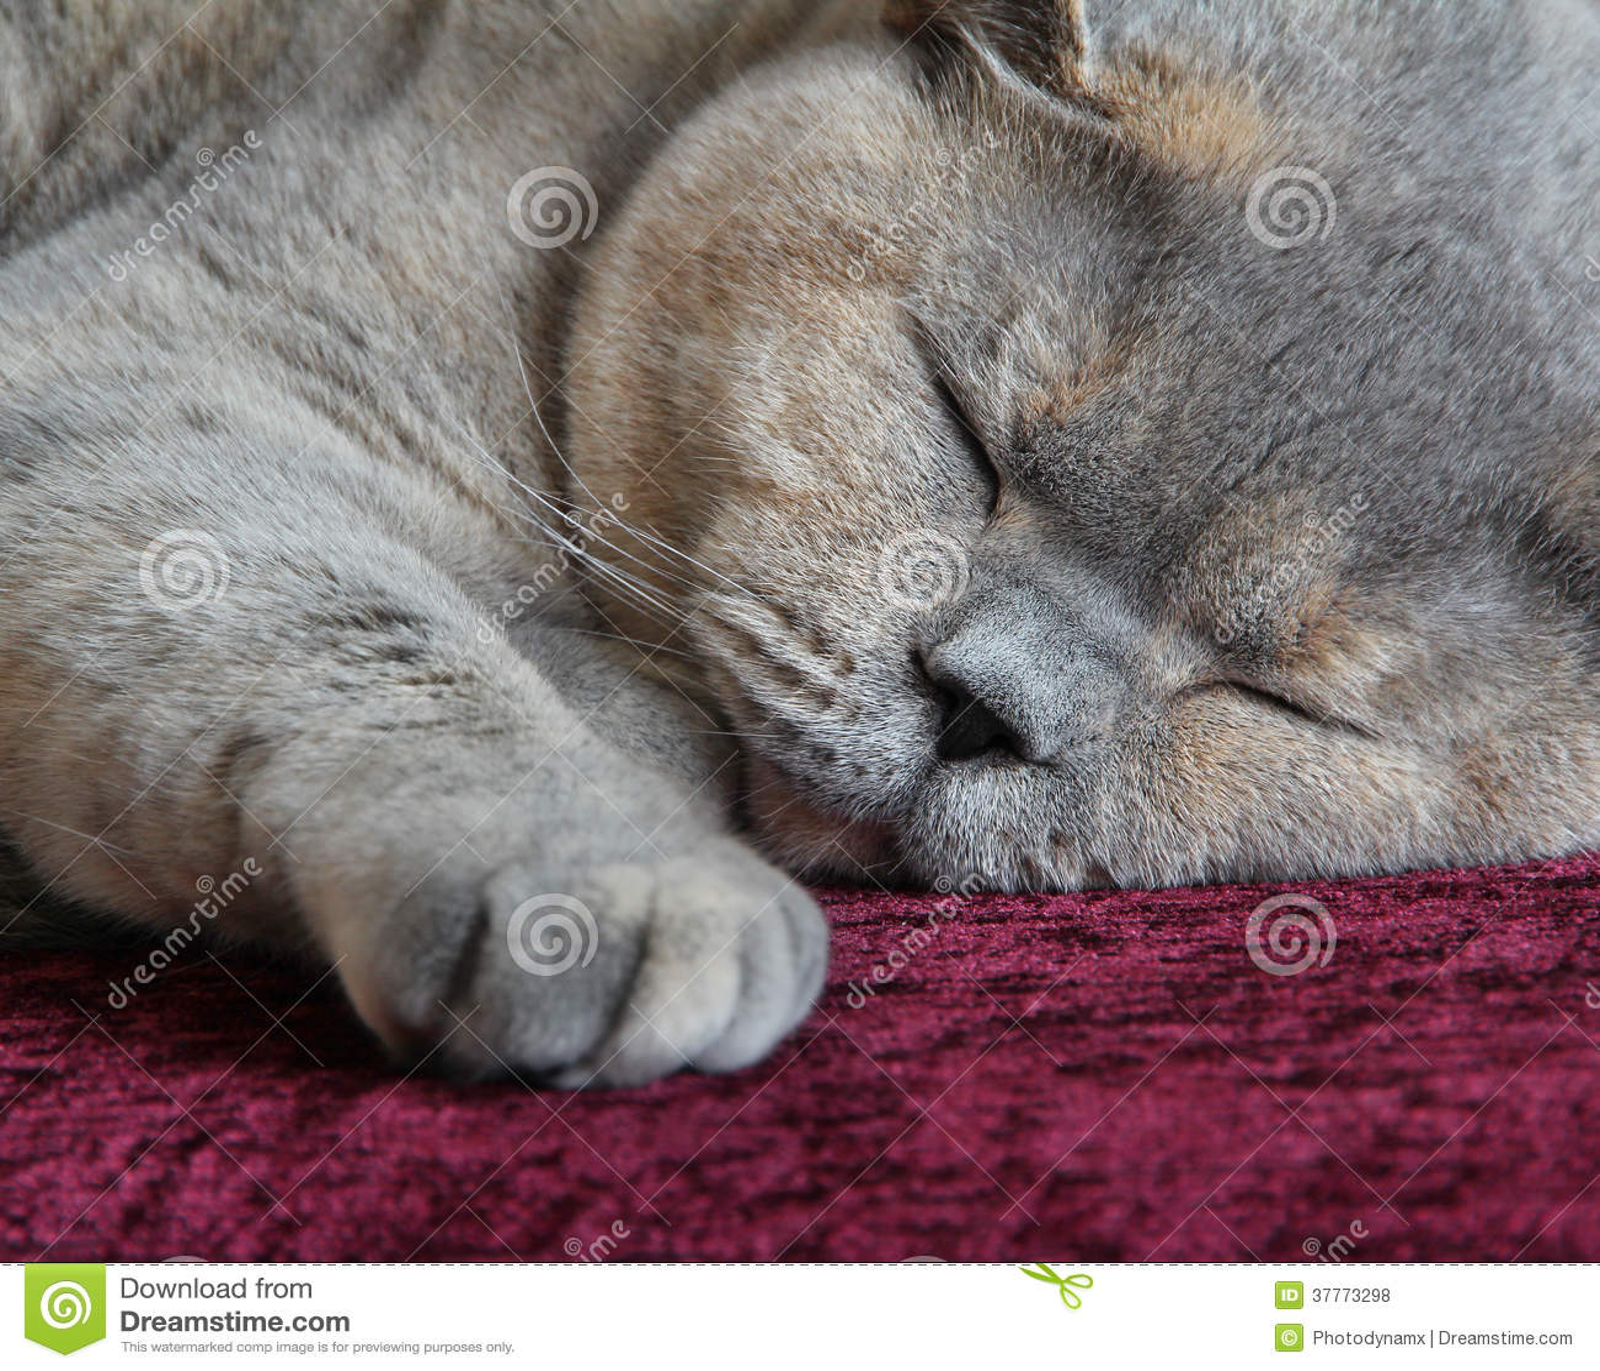 Cosy cat sleeping